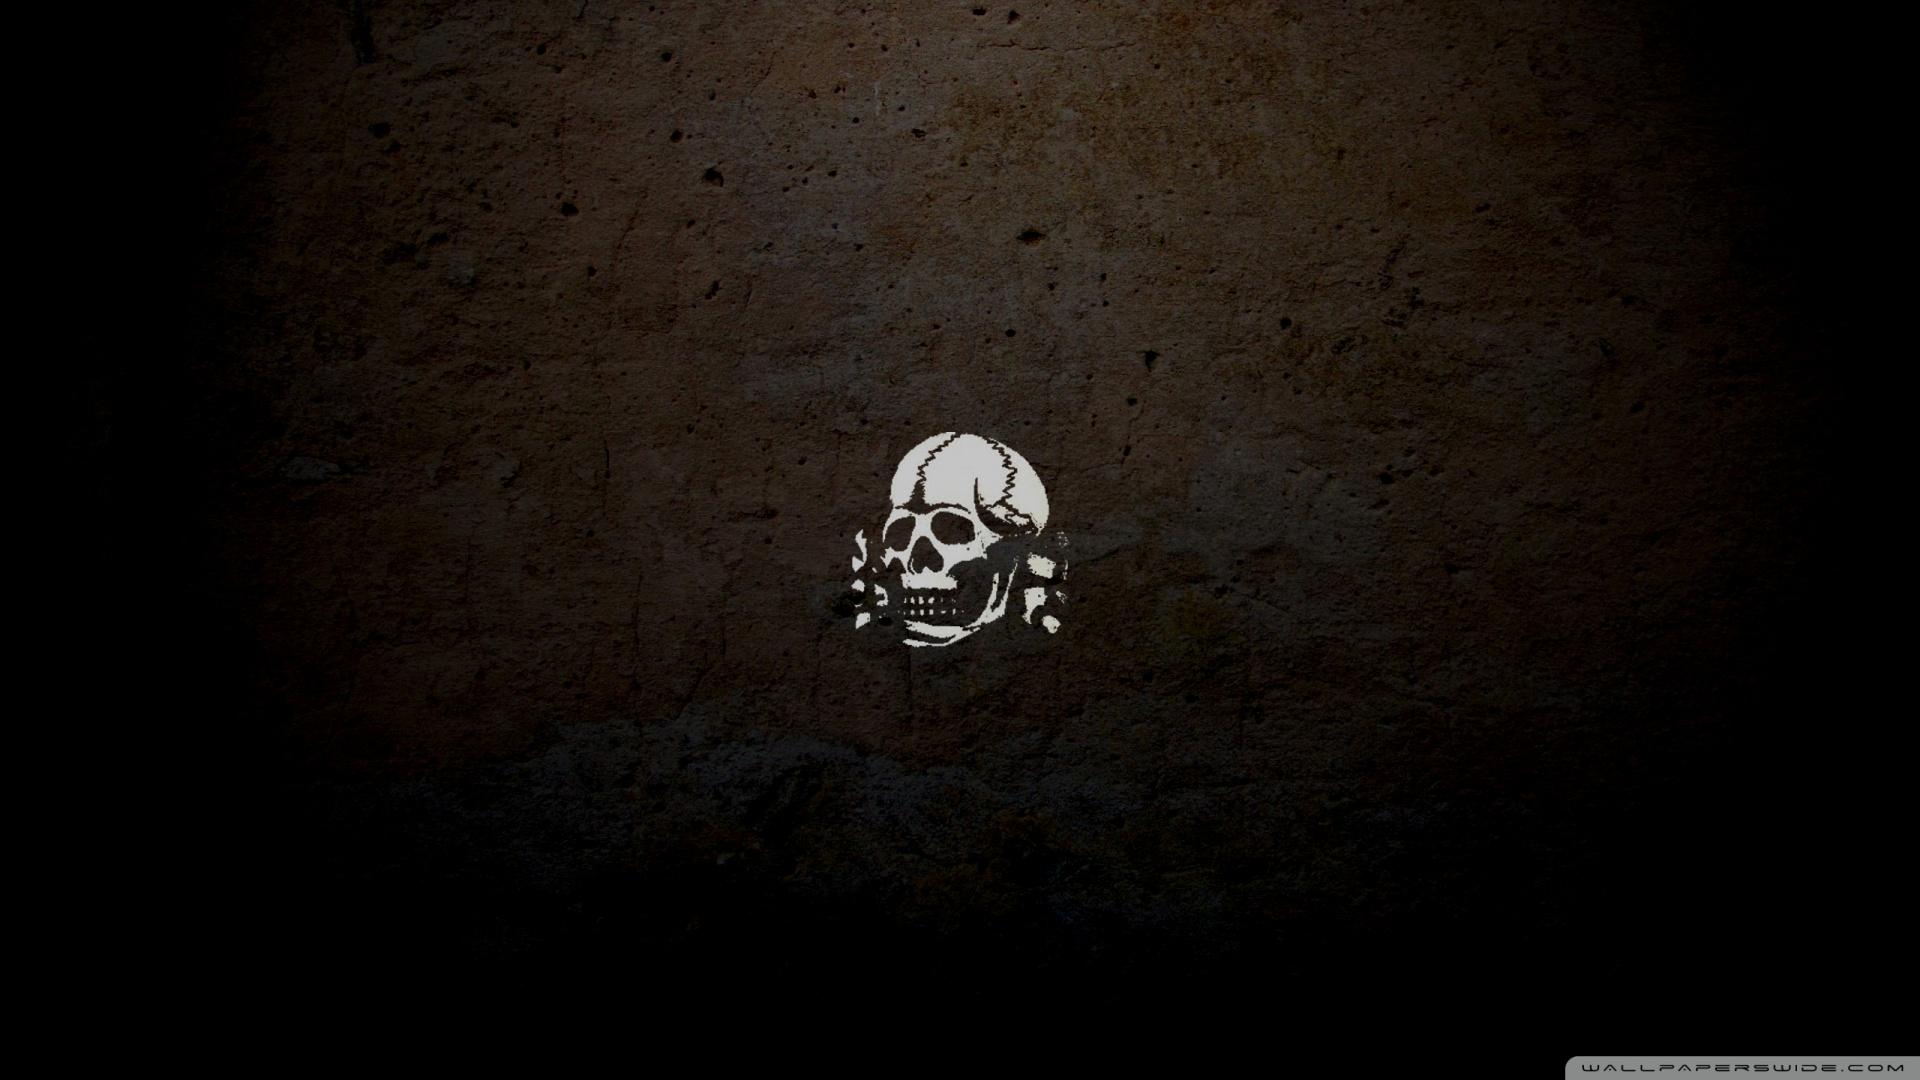 skull wallpaper images 1920x1080 1920x1080